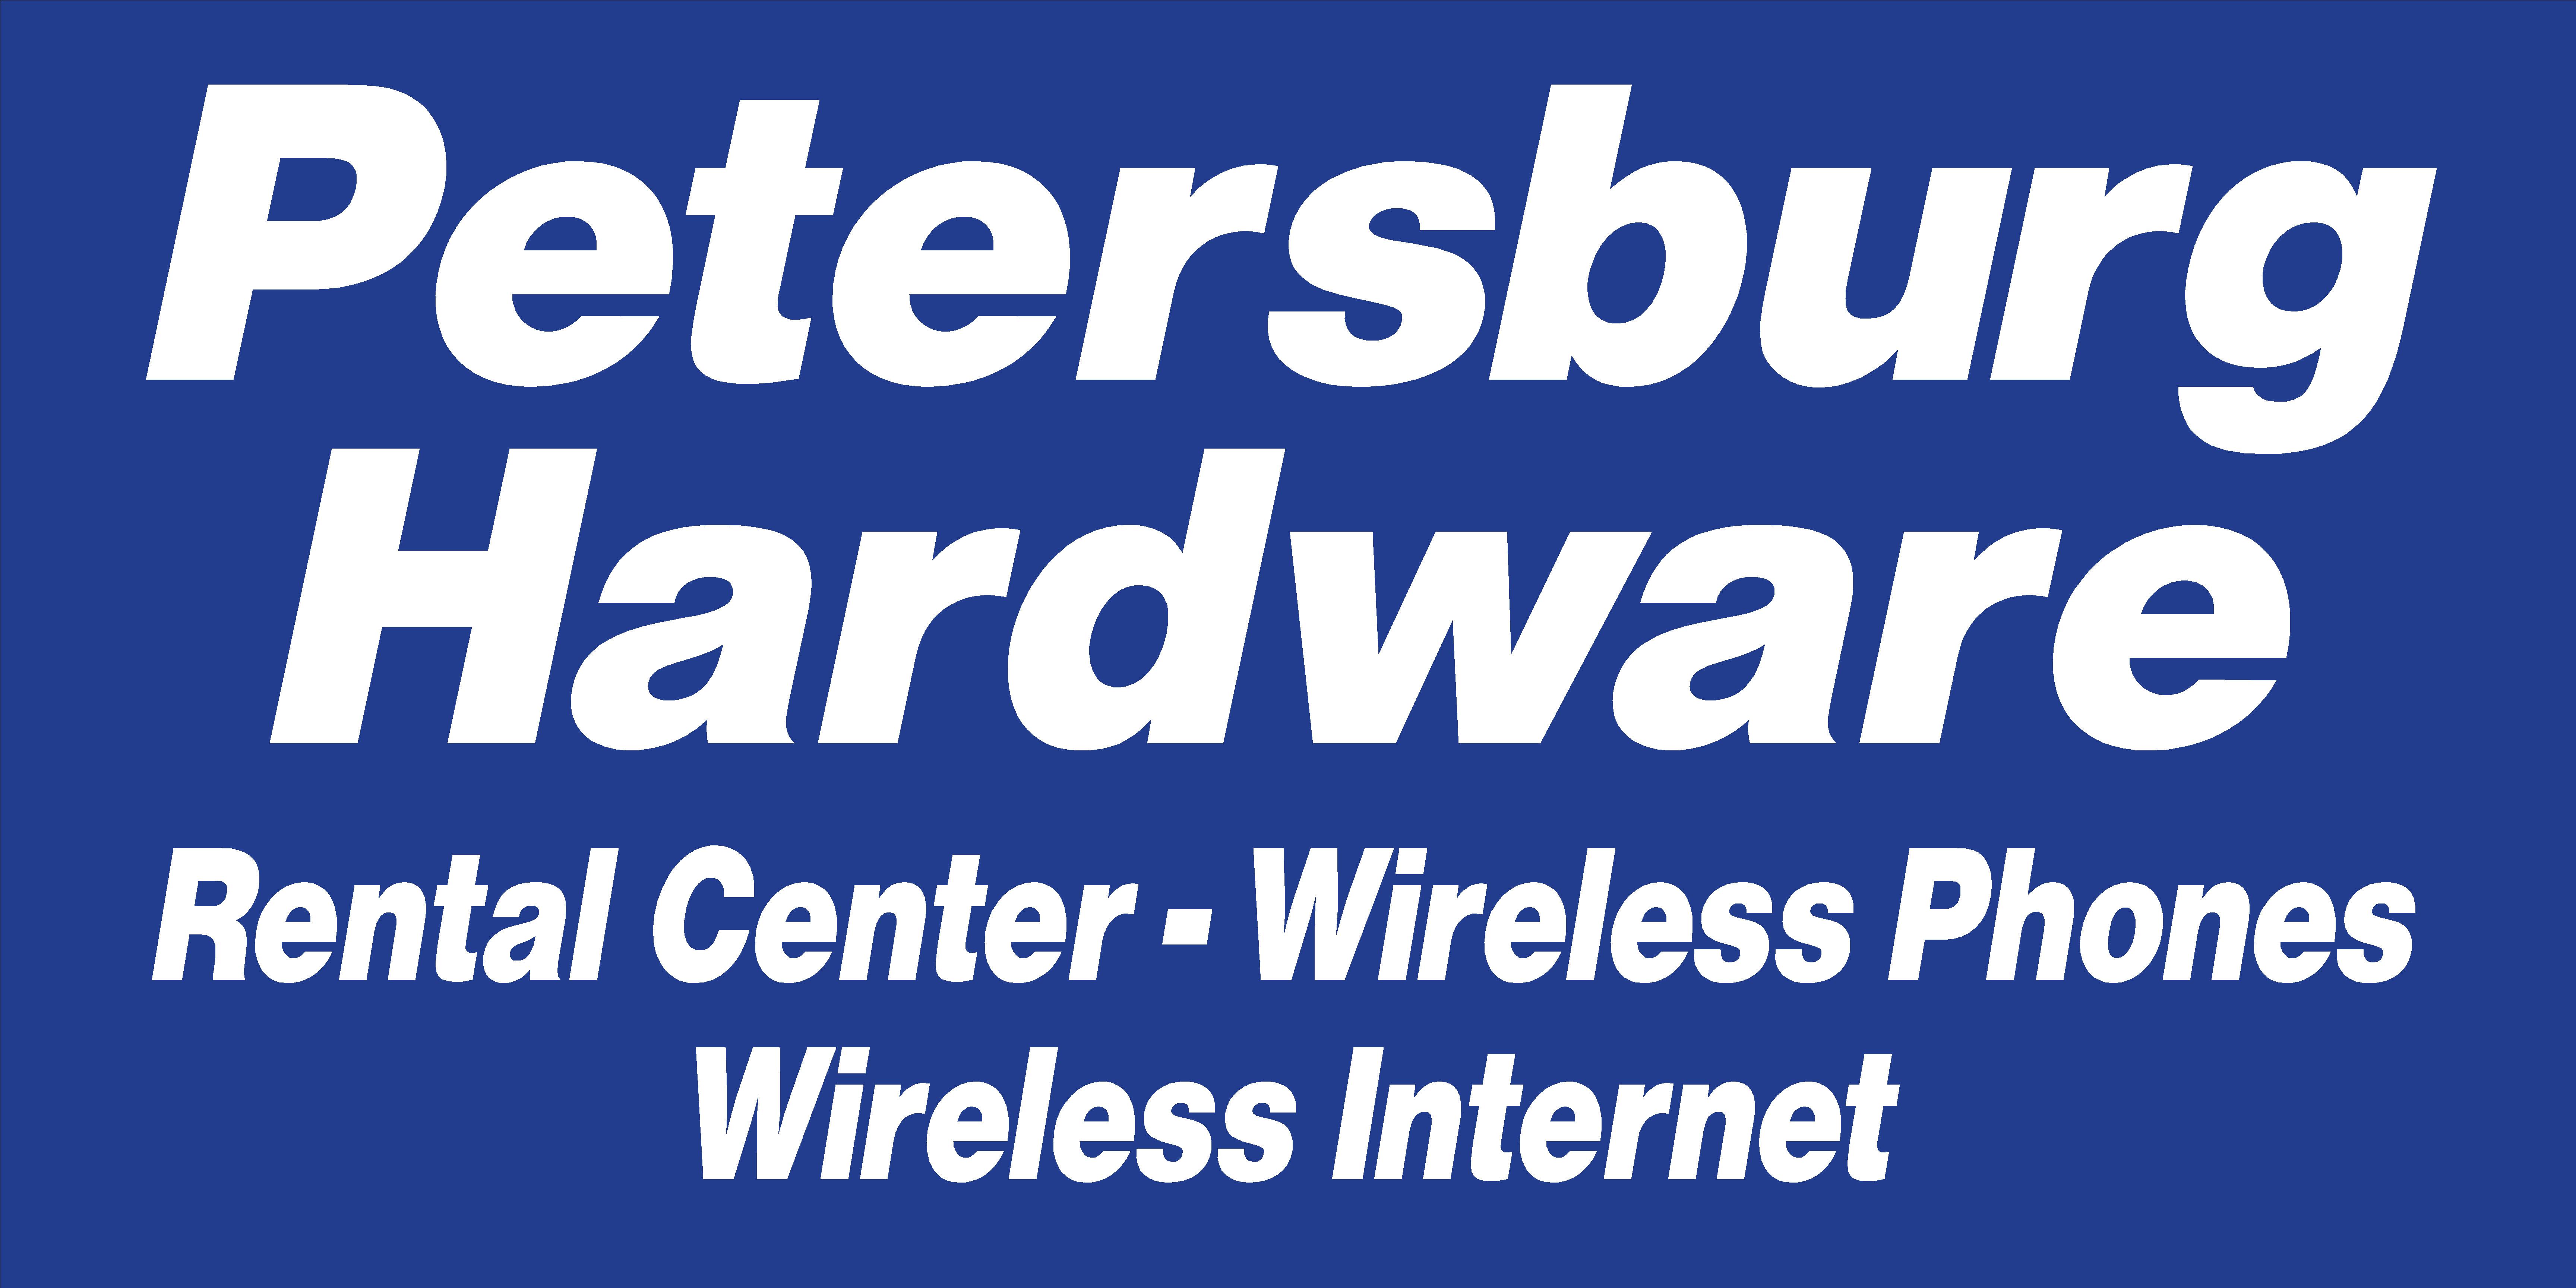 Petersburg-Hardware